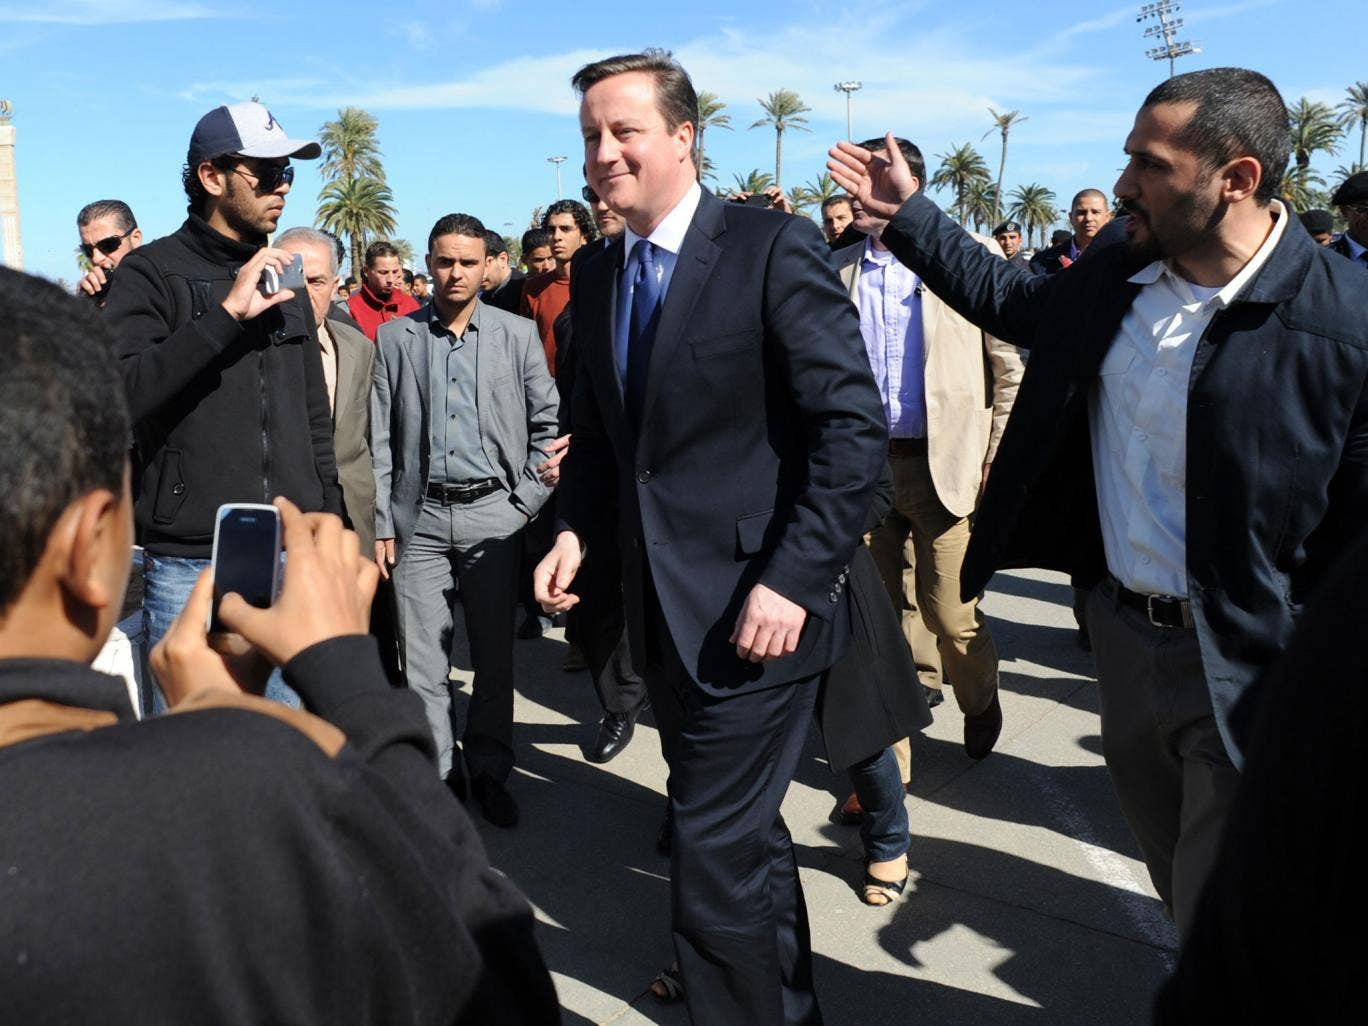 Prime Minister David Cameron takes a walk through Martyrs Square